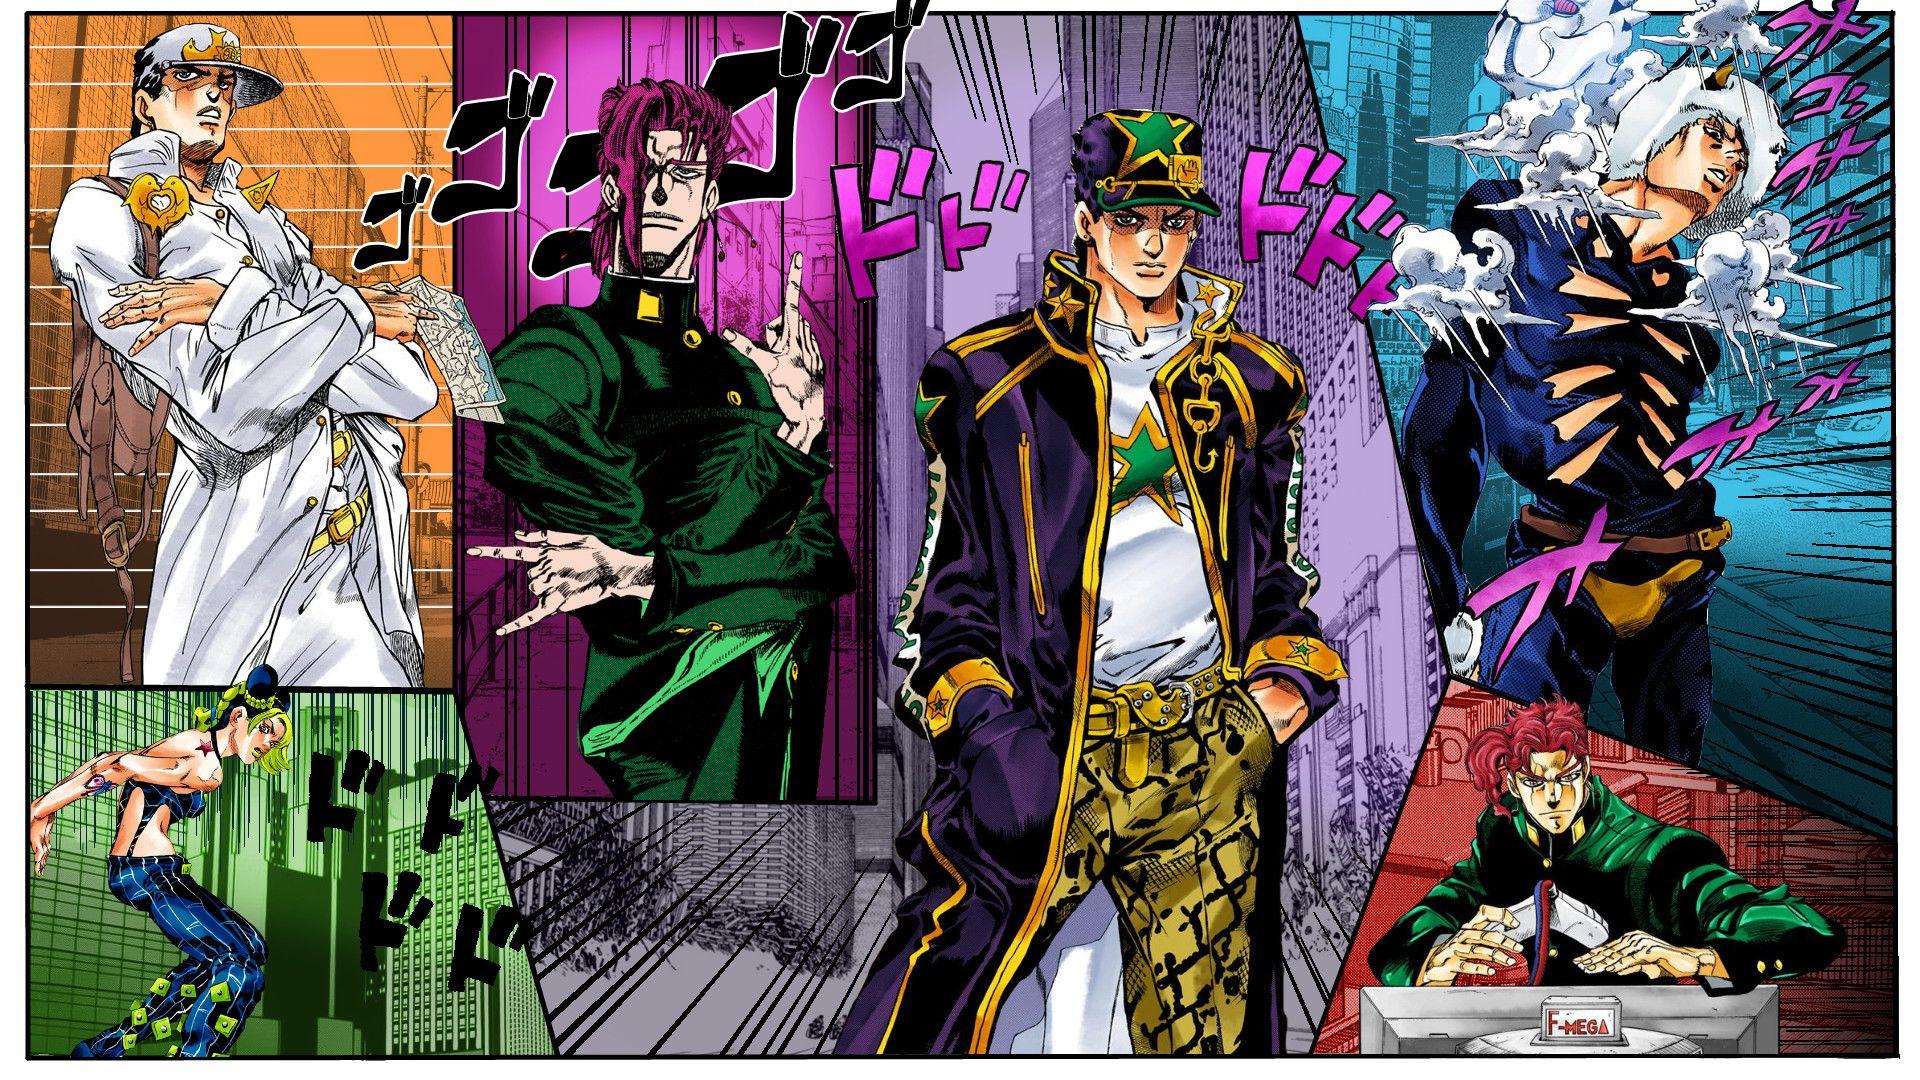 Res 1920x1080 Jojo Manga Panel Wallpaper Jojo Bizzare Adventure Jojo Bizarre Jojo S Bizarre Adventure